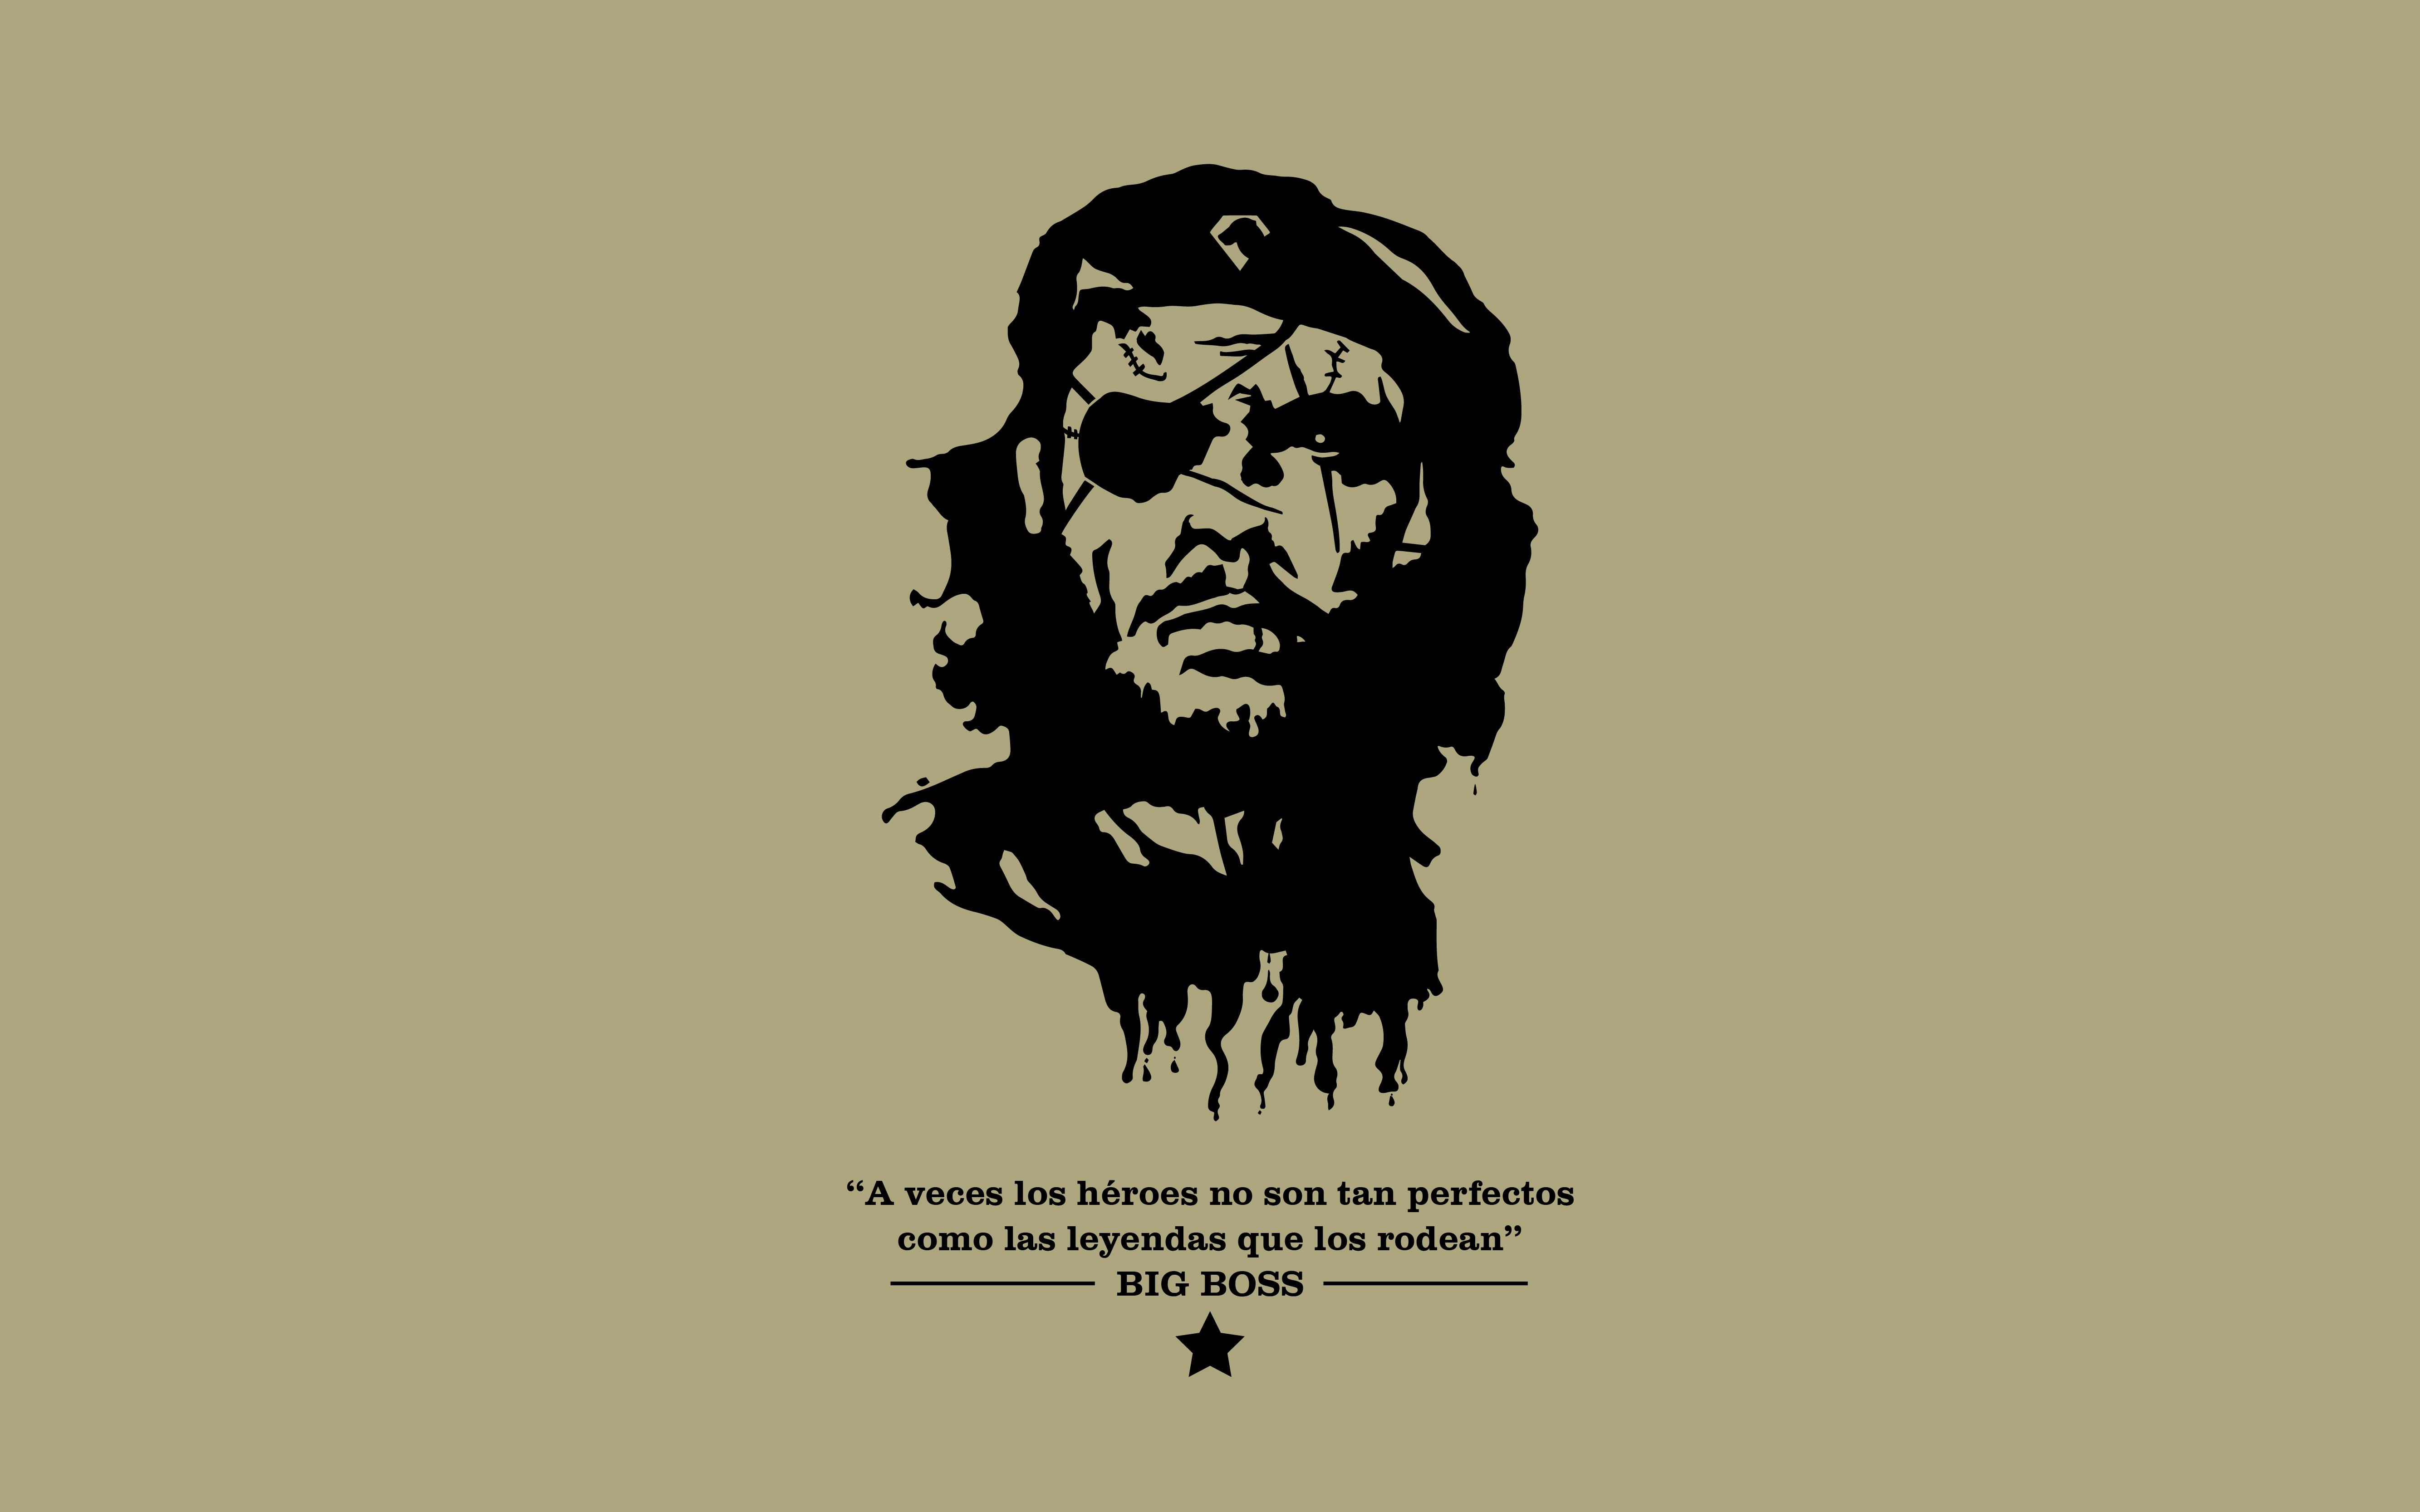 ... Che Guevara like Big Boss Wallpaper 2.1 by Moloch15